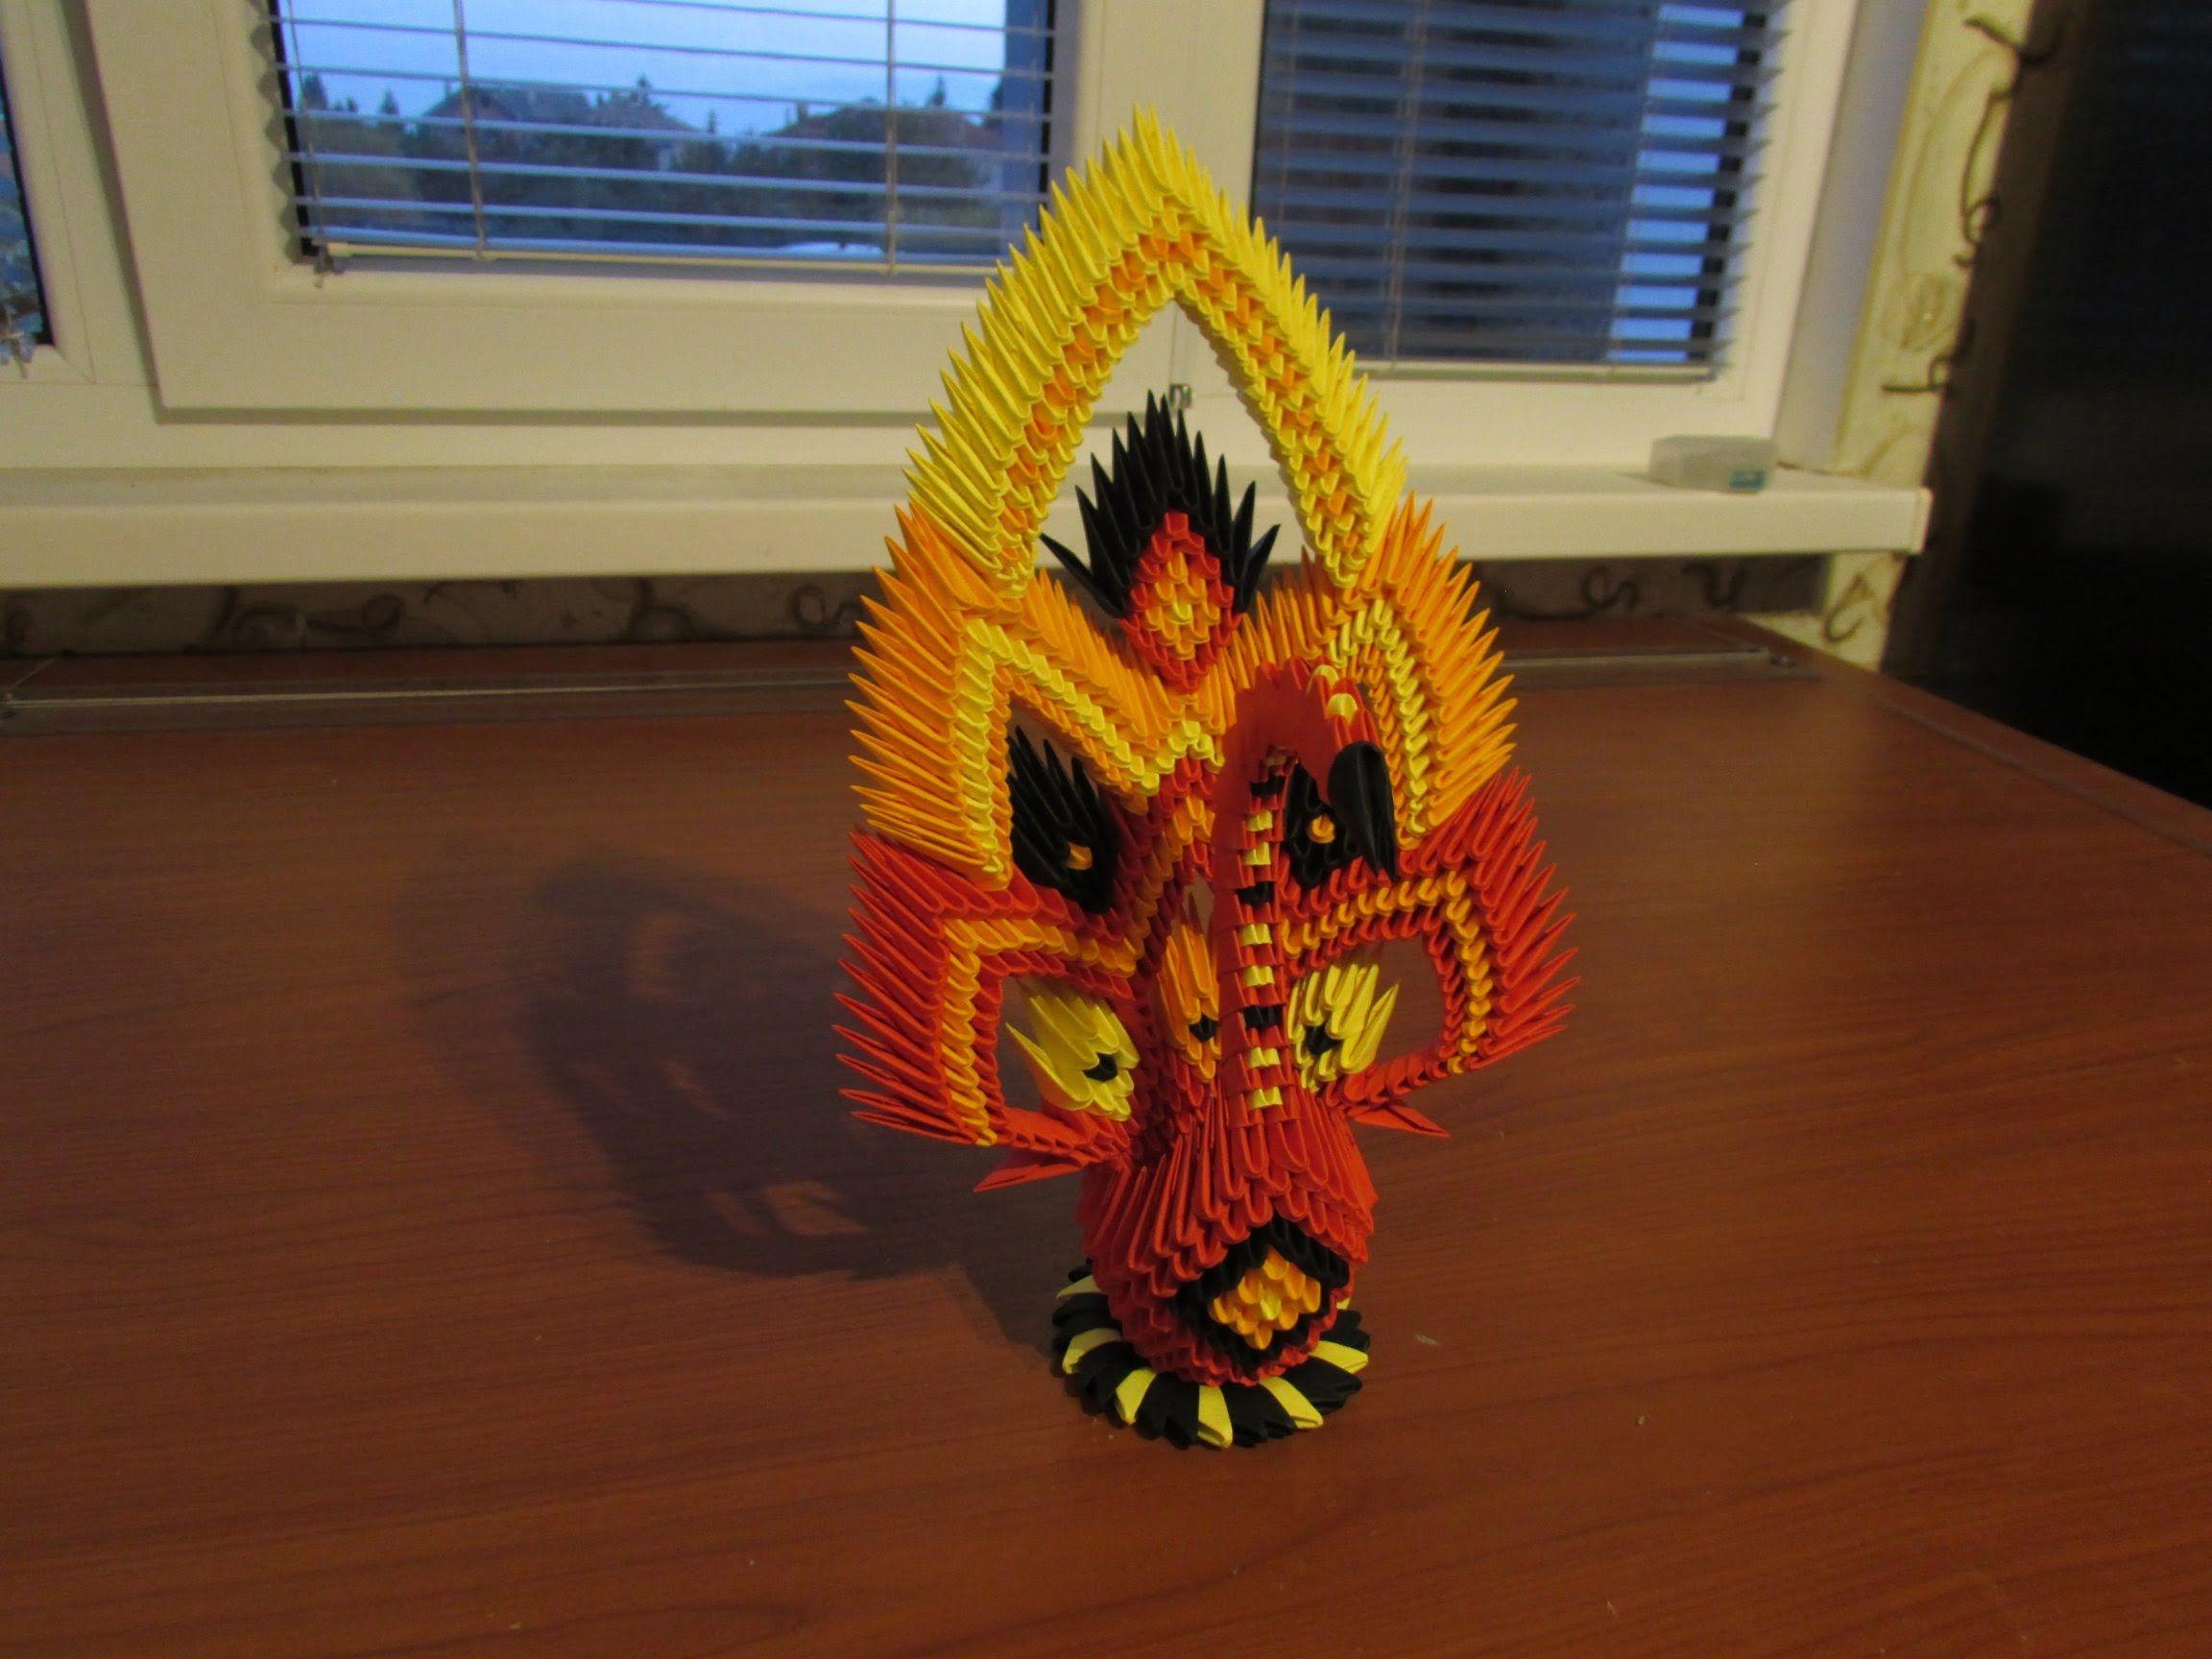 3D Origami Peacock Tutorial | * Origami * | Pinterest ... - photo#29